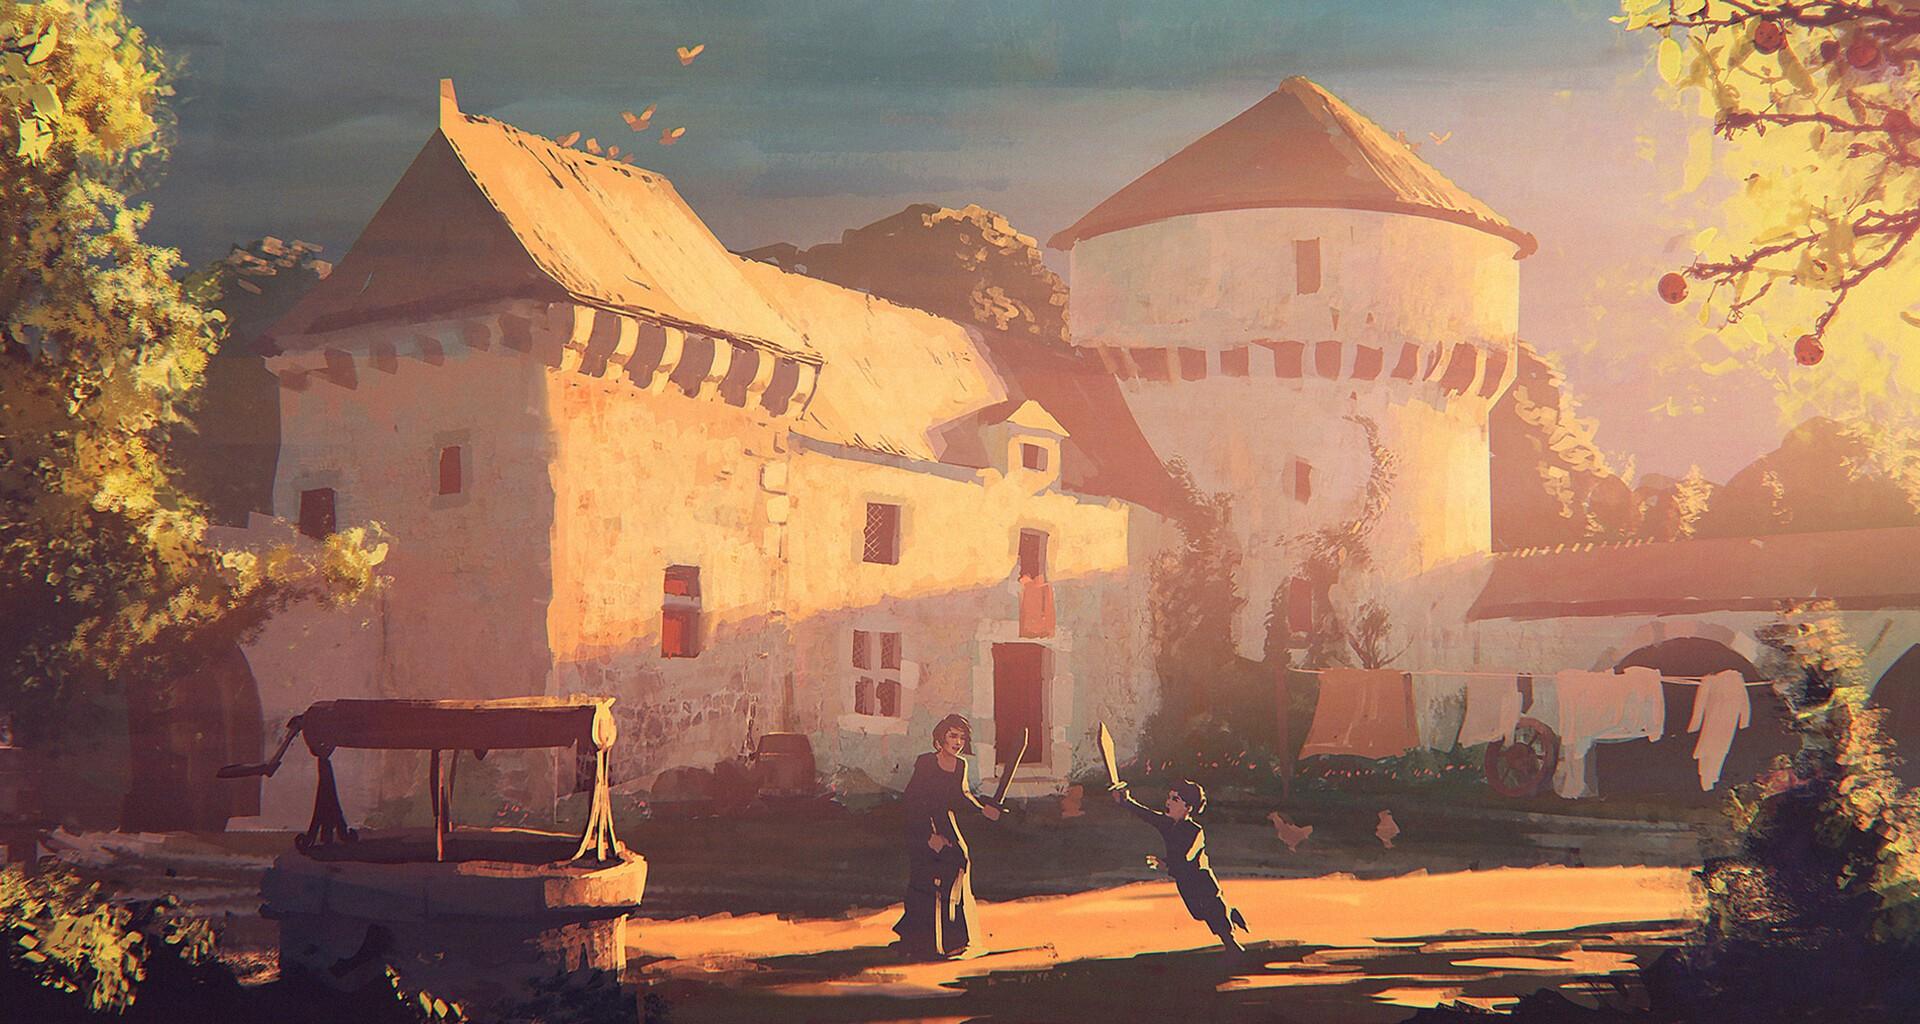 © Olivier Ponsonnet, Concept art, A Plague Tale: Innocence, Asobo Studio, Focus Home Interactive.